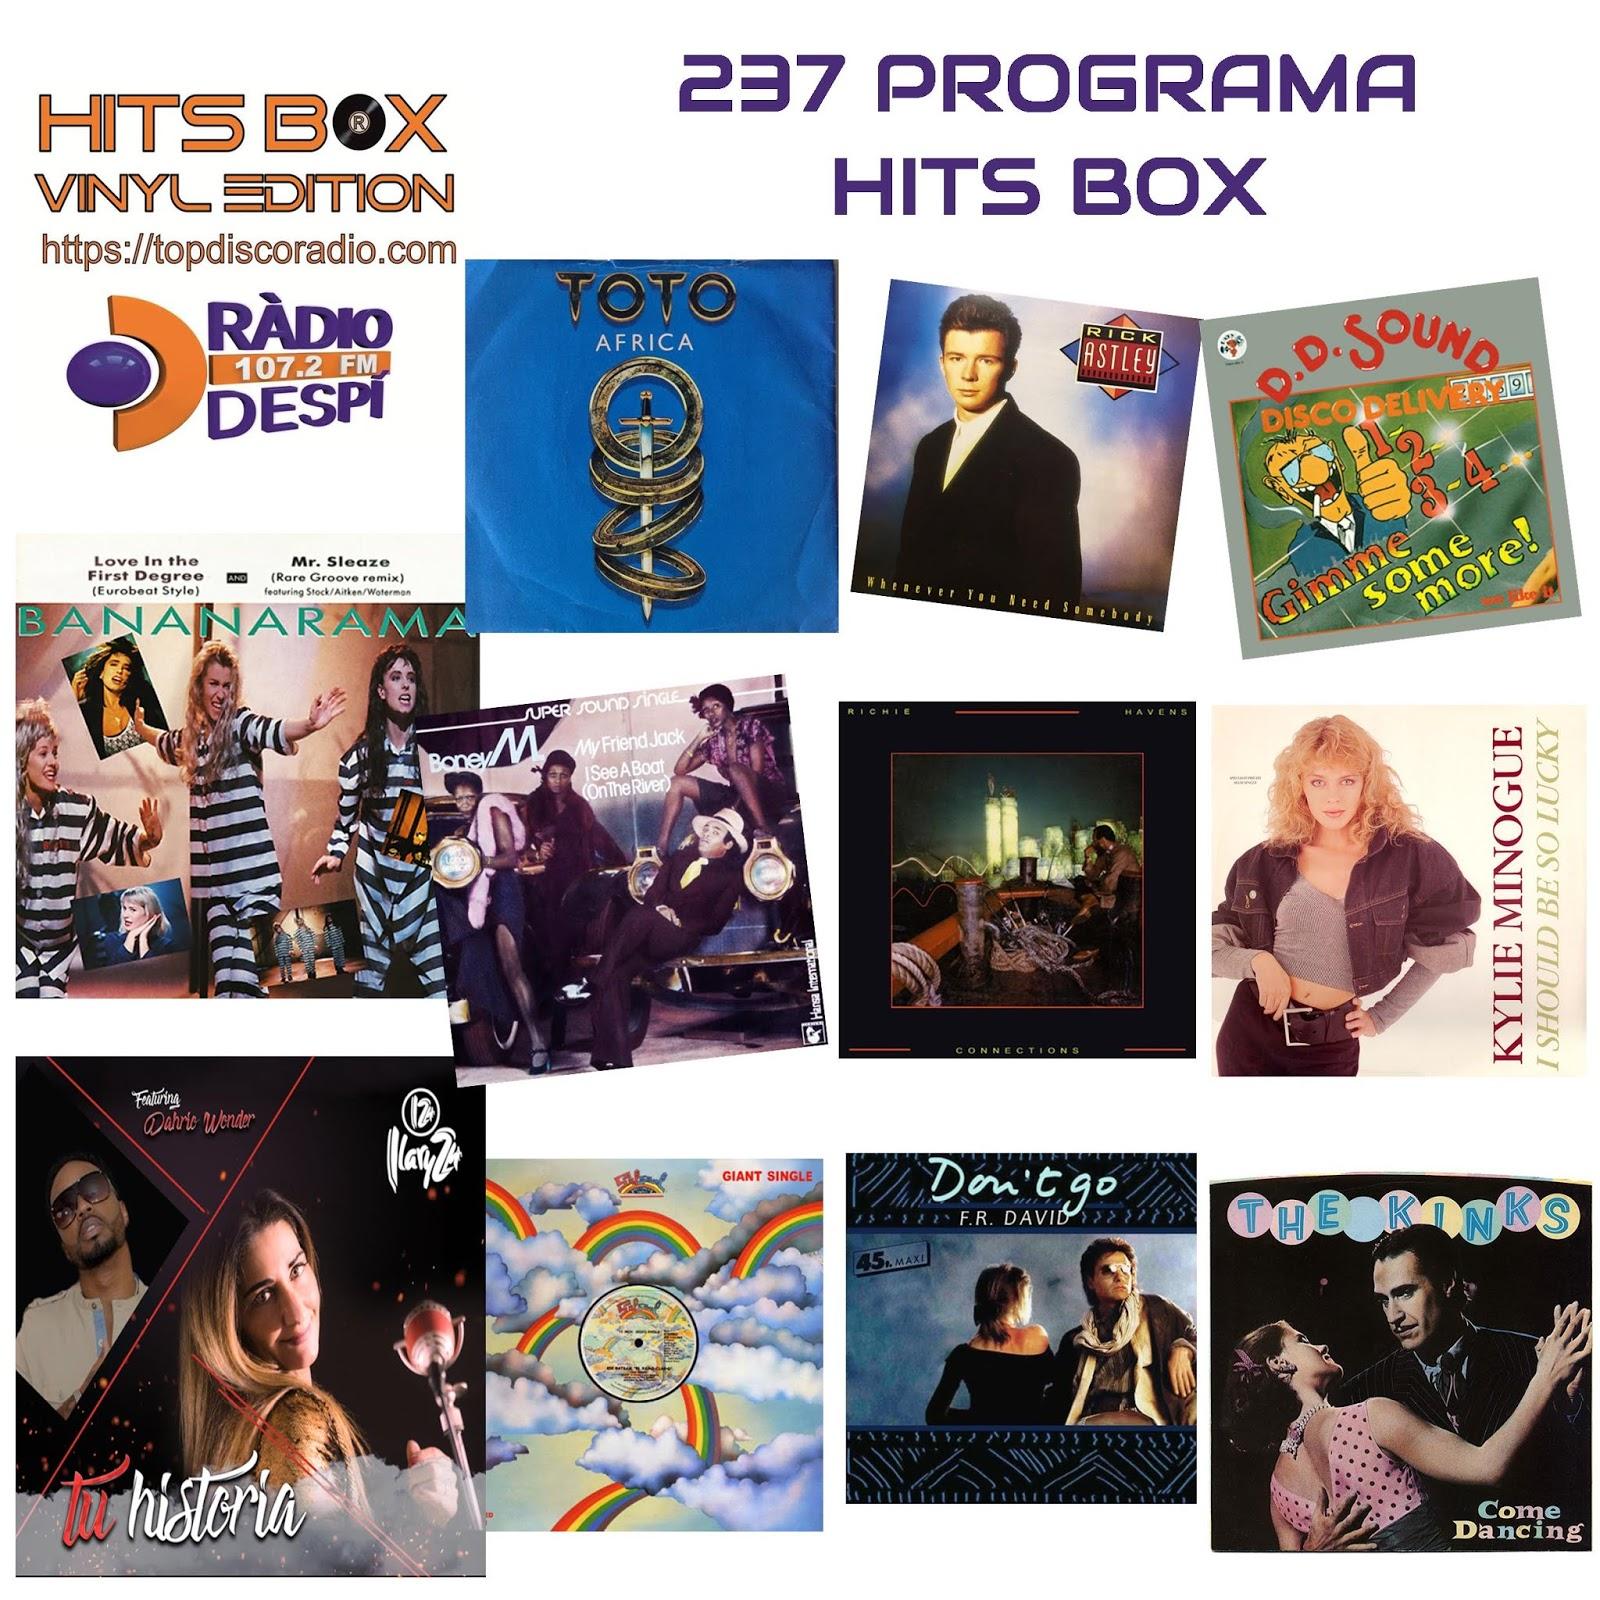 237 Programa Hits Box Vinyl Edition